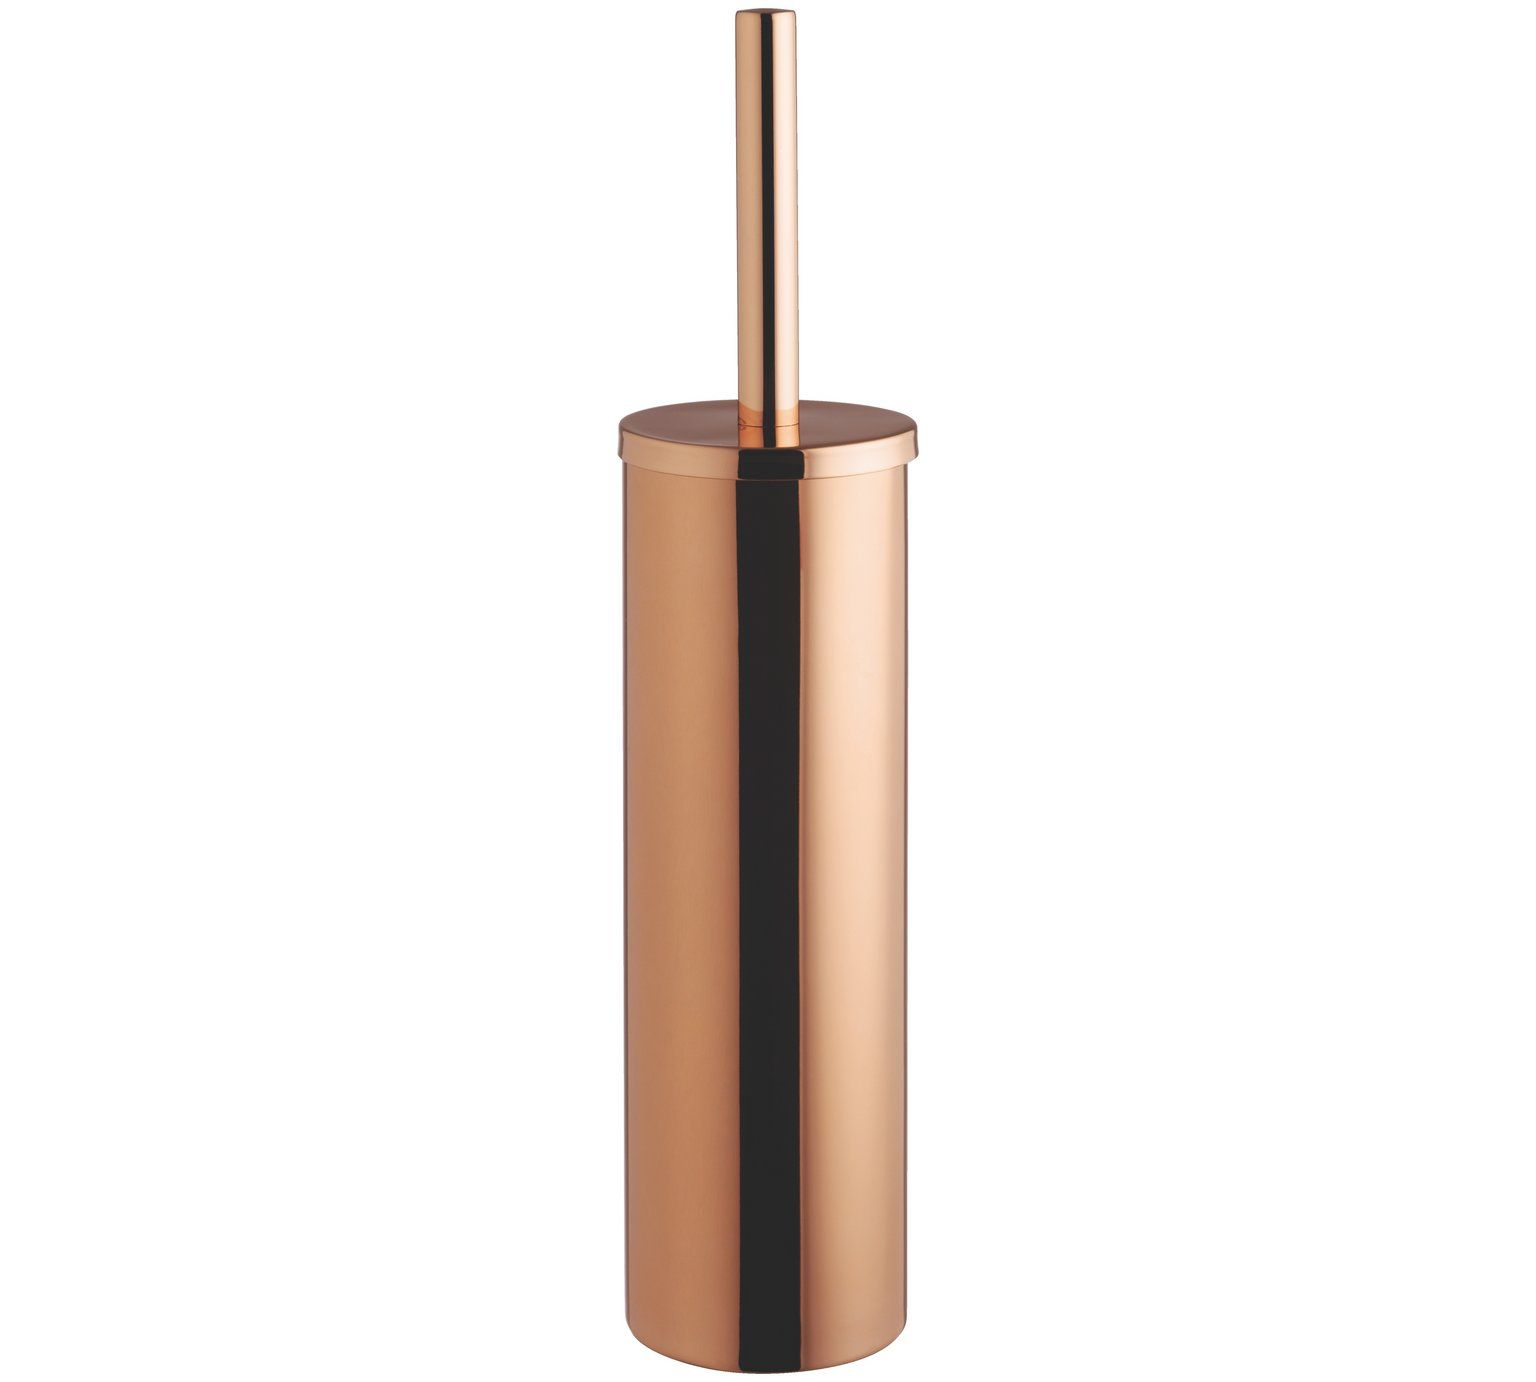 Copper Bathroom Accessories Argos